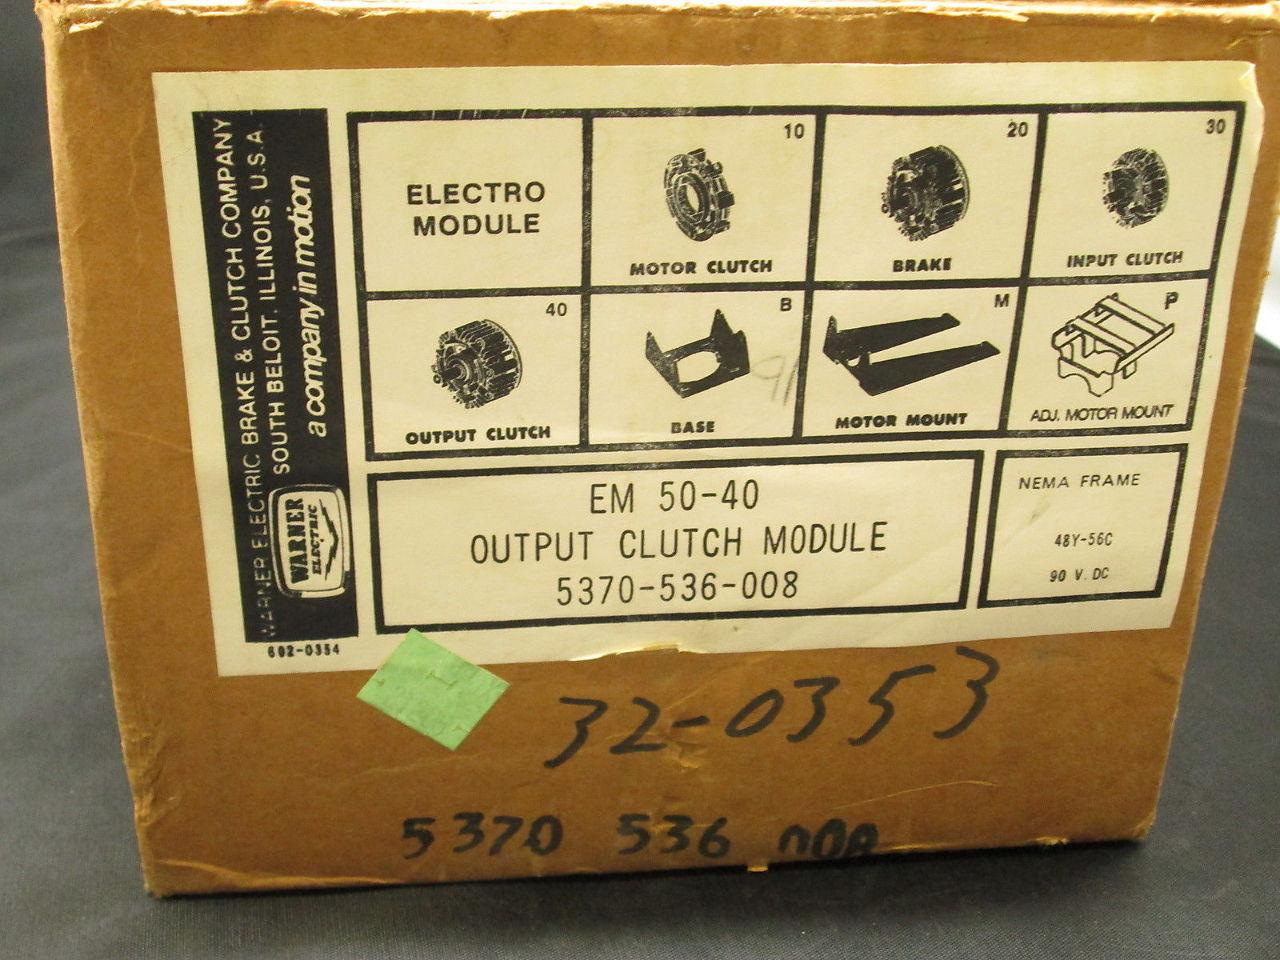 ... Warner Electric Electro Module EM-50-40 5370-536-008 Output Clutch